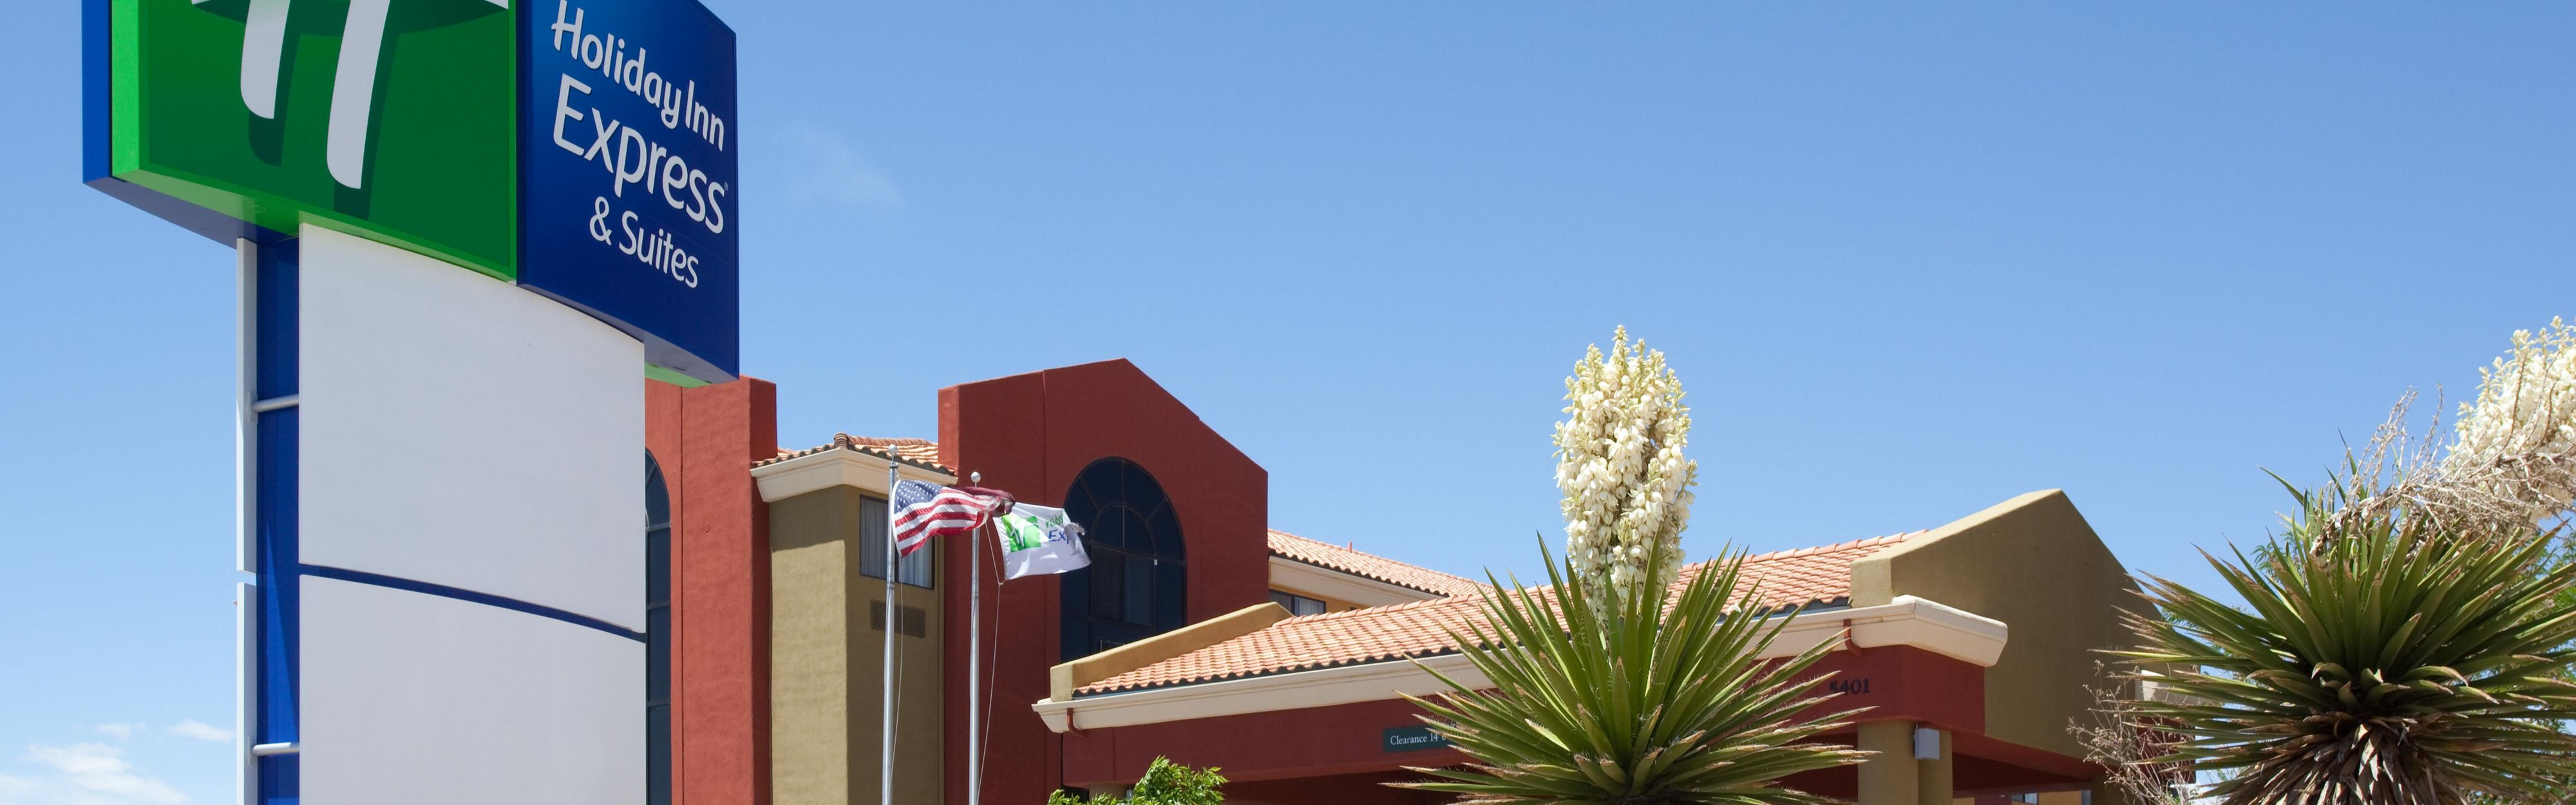 Holiday Inn Express & Suites Albuquerque-N. Balloon Fsta Pk image 0